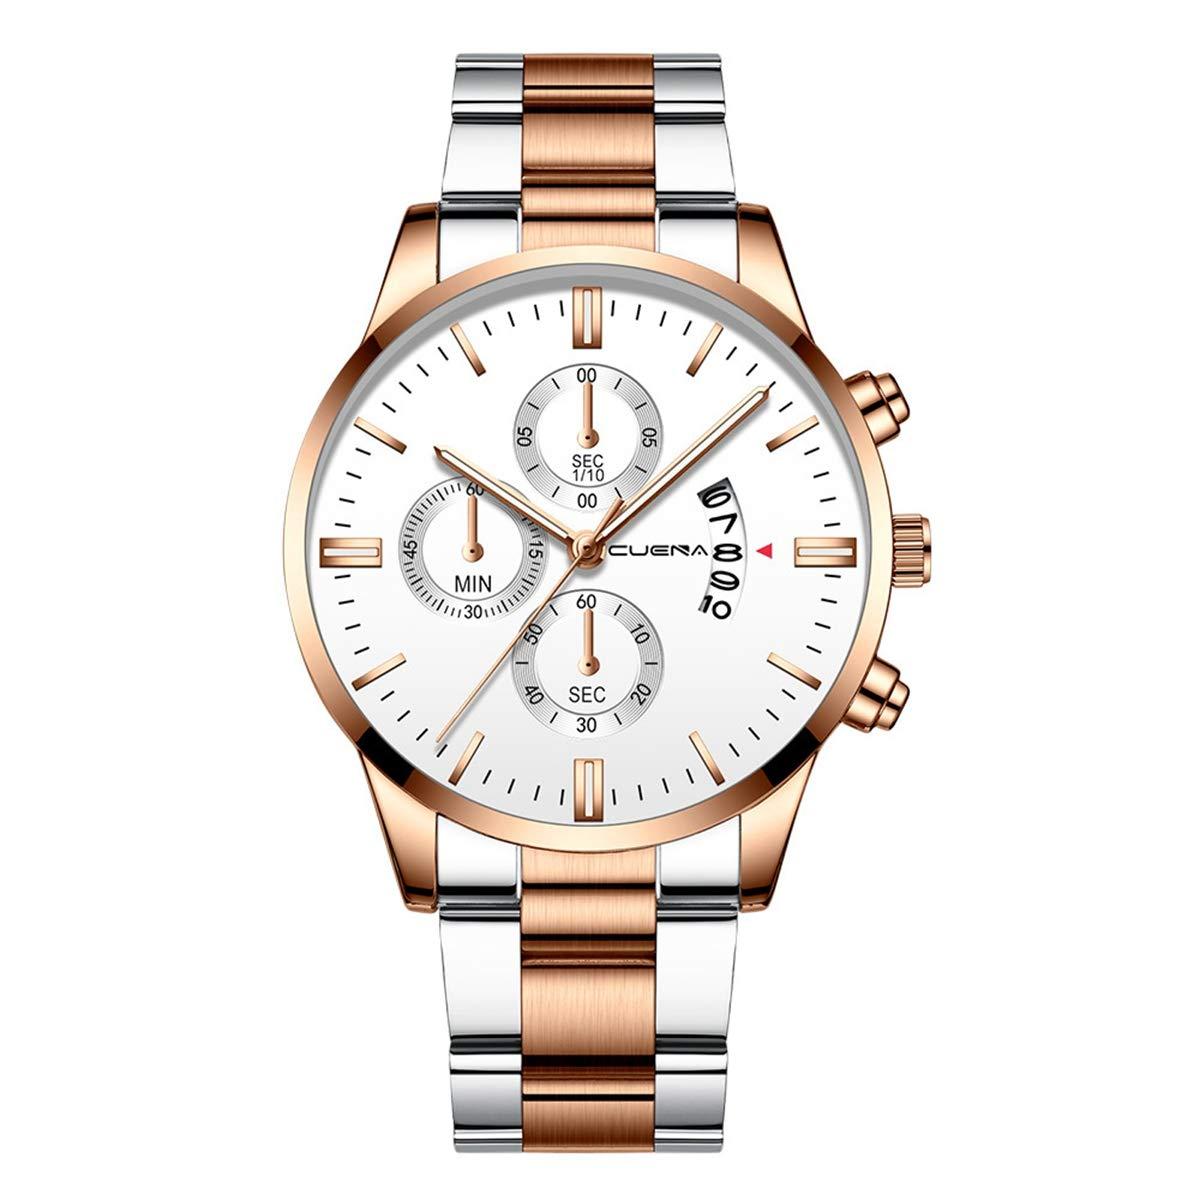 ZODRQ Men's Watch,Fashion Waterproof Sport Watches Stainless Steel Wrist Watch Wristwatch Date Quartz Watch for Men Gift (E) by ZODRQ